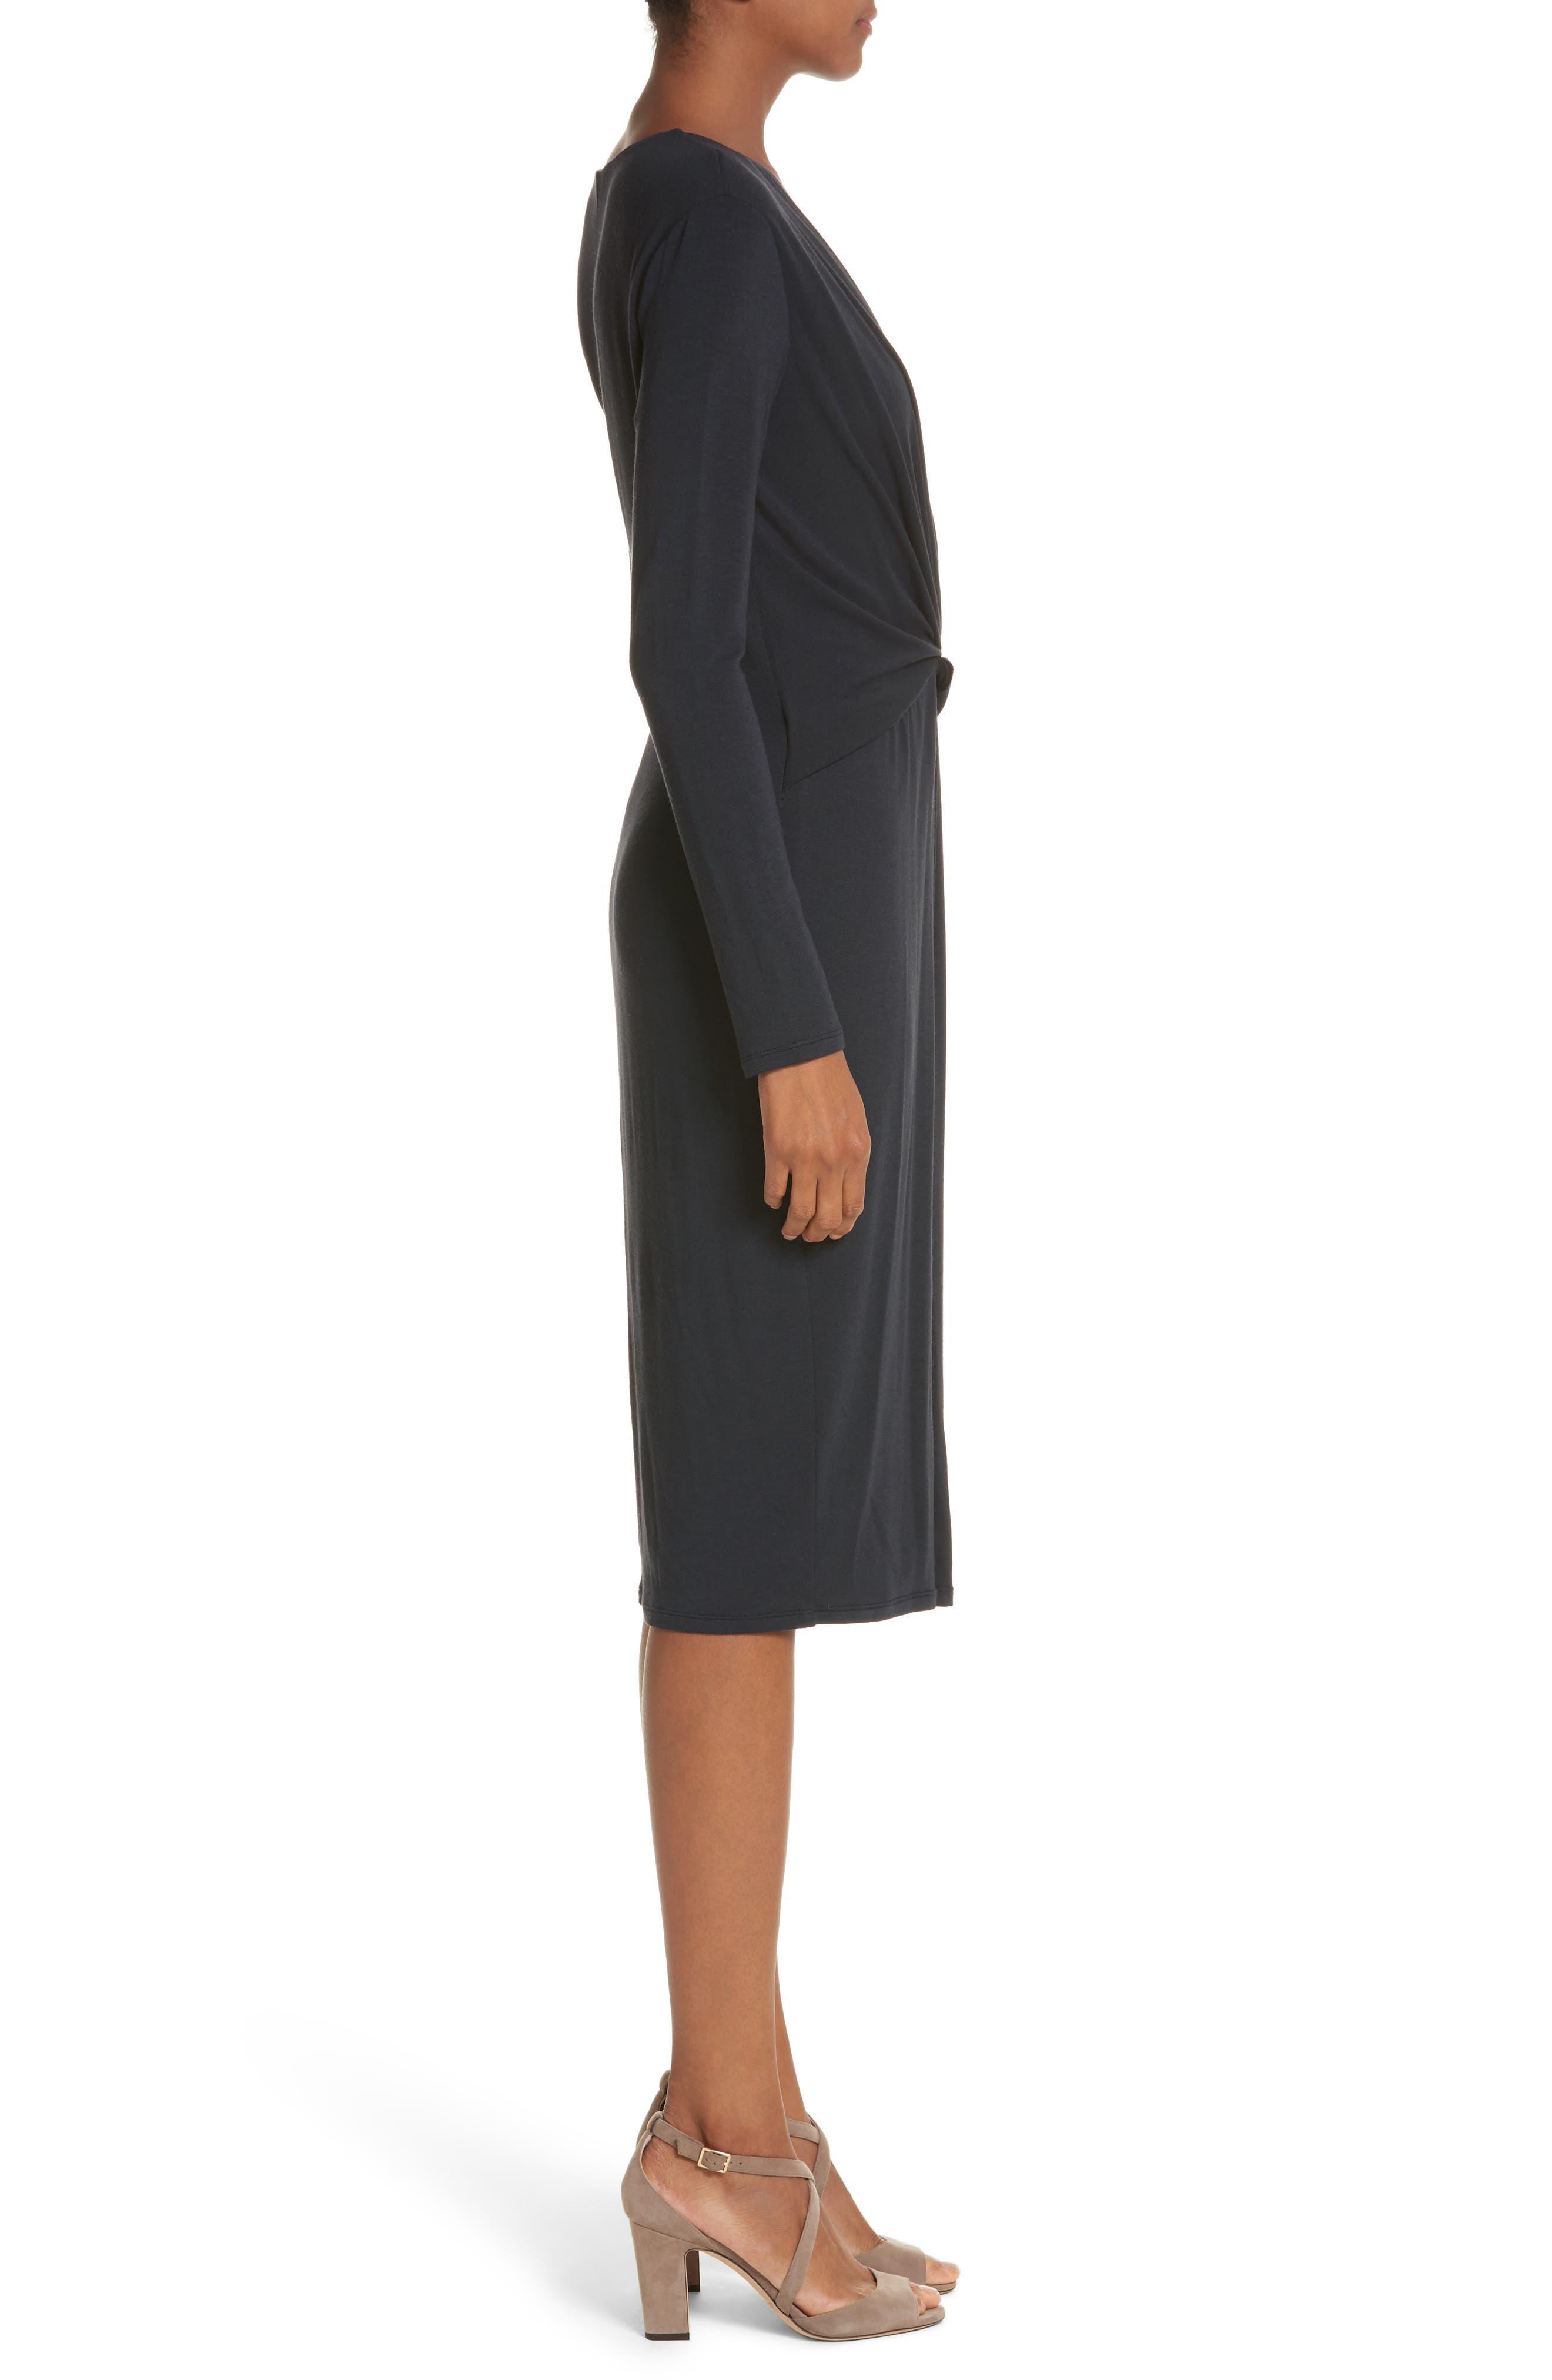 Petalo Twisted Dress,                             Alternate thumbnail 3, color,                             Navy Blue